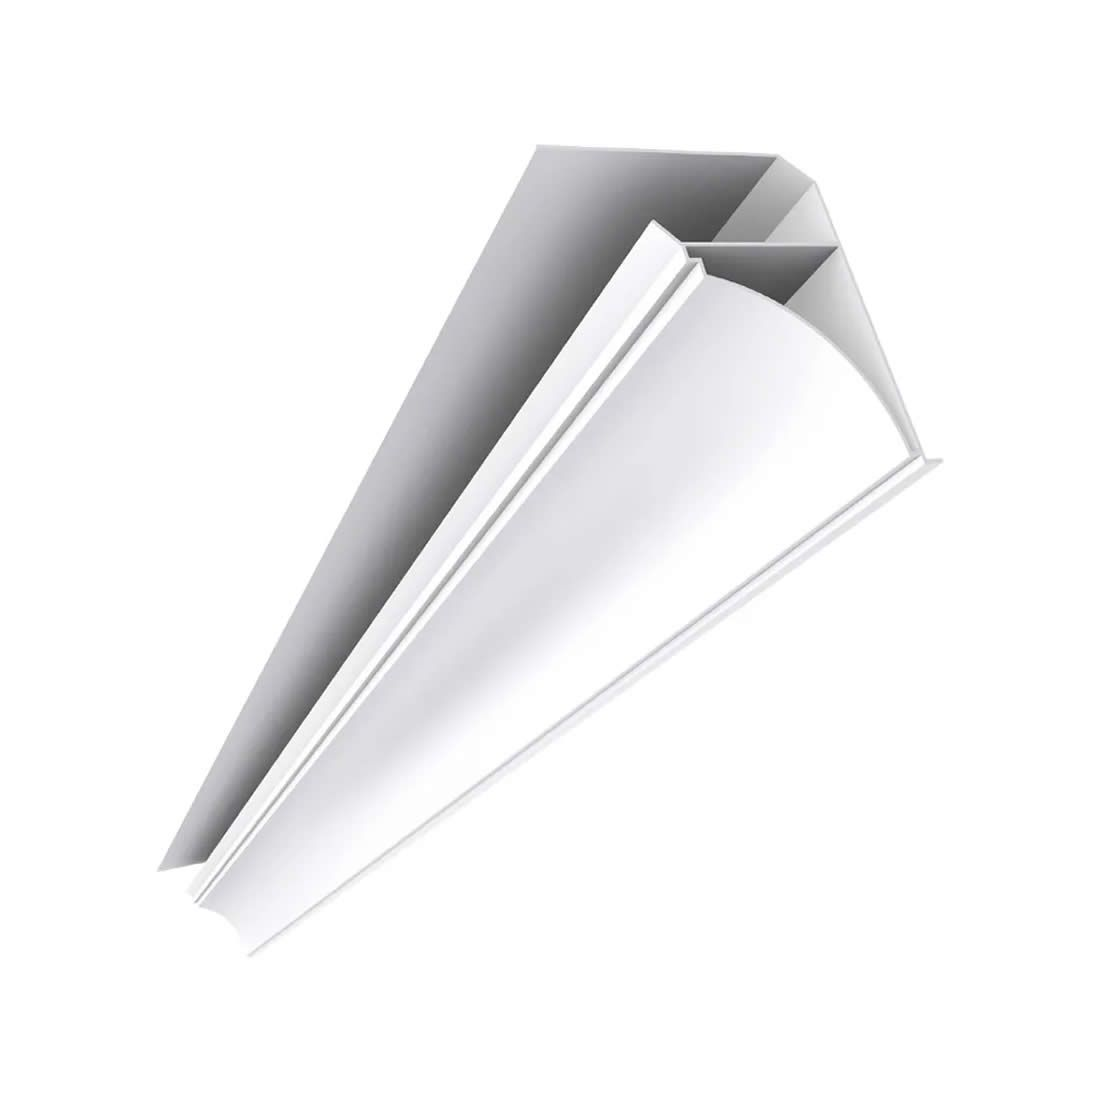 Roda Forro PVC Tipo Colonial Branco Mais PVC Peças com 6,00mts